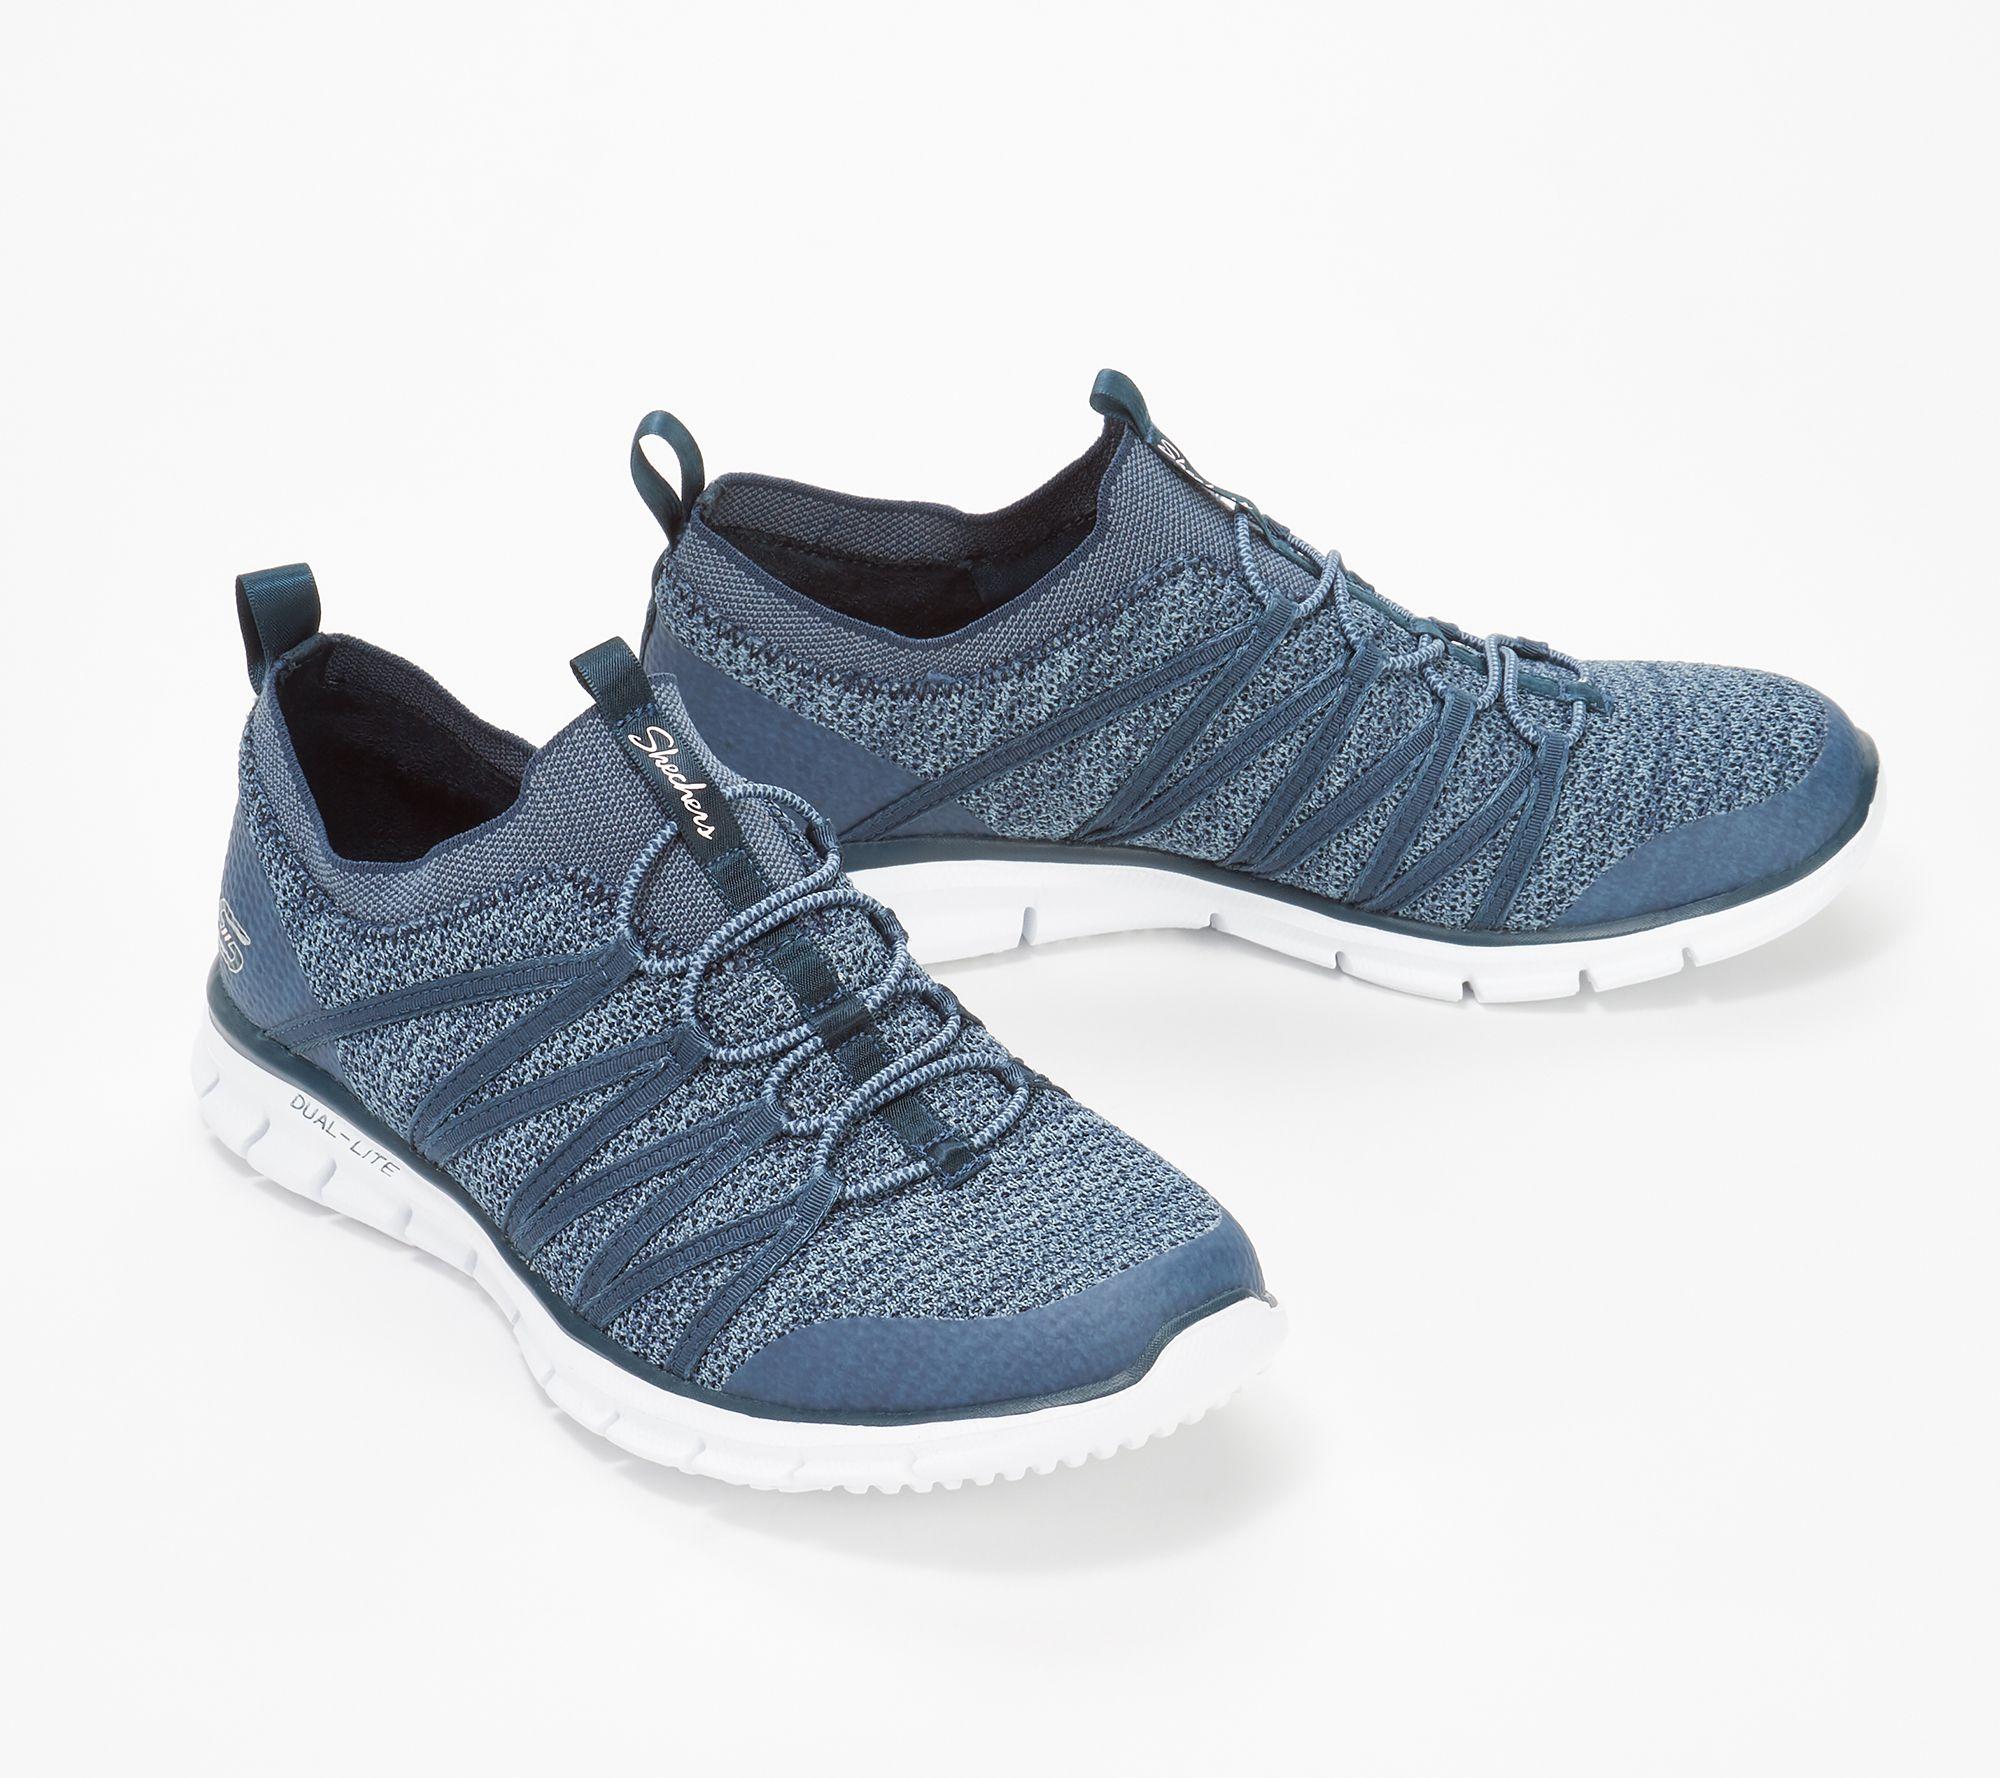 3e5b8fad362 Skechers Stretch-Knit Bungee Slip-On Sneakers - Glider Tuneful — QVC.com